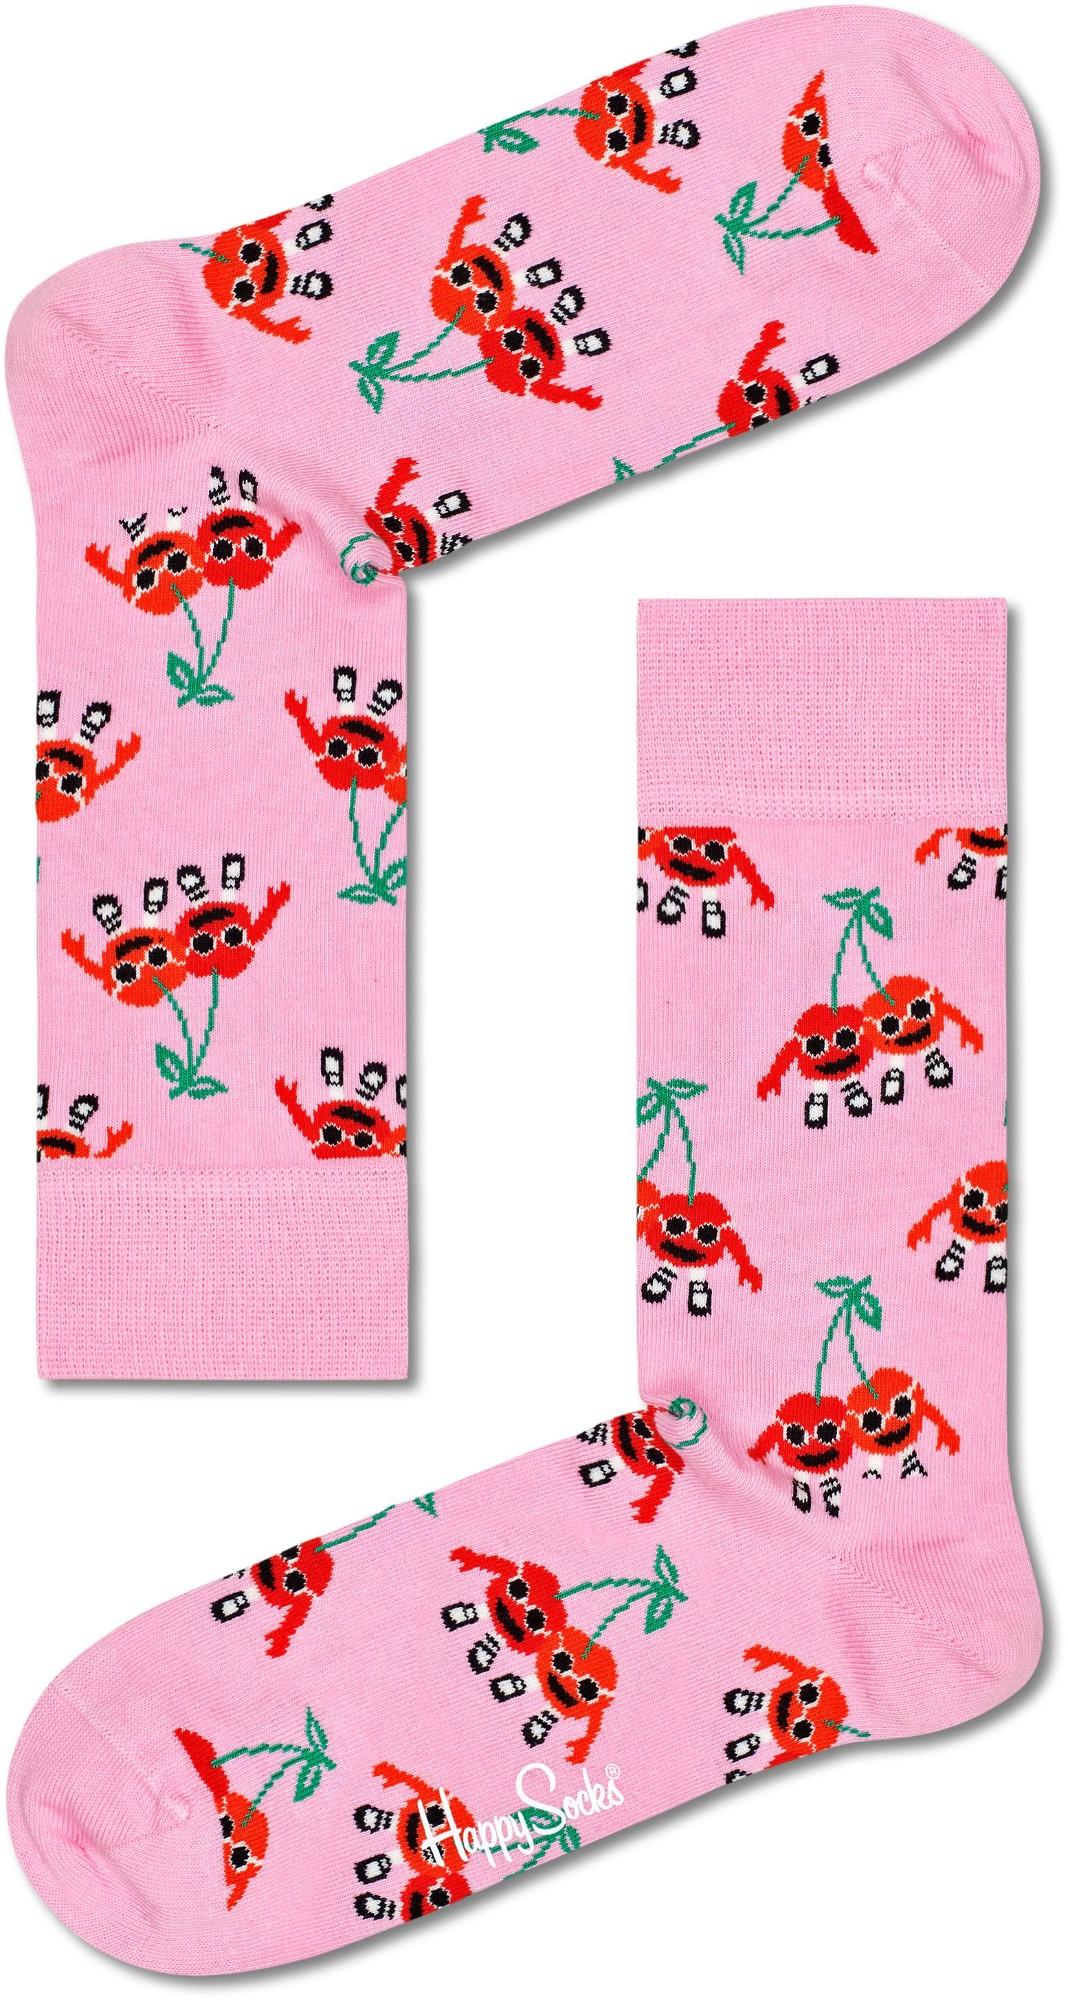 Happy Socks Cherry Mates Multi 3000 41-46